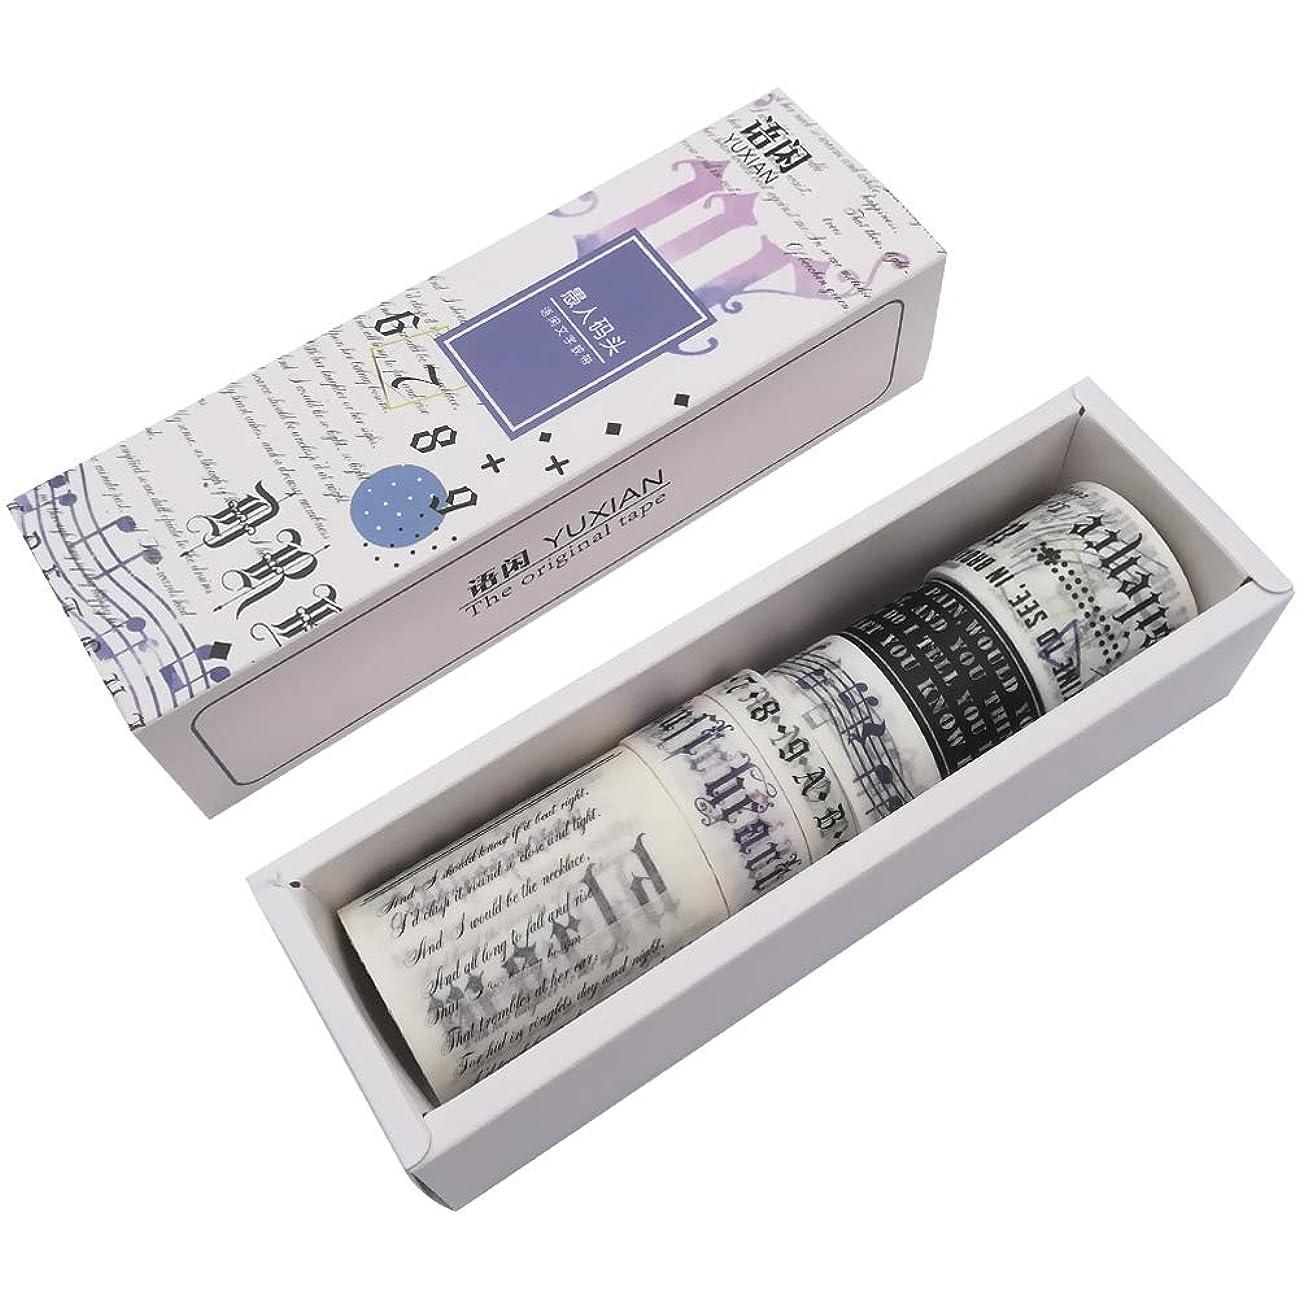 6 Rolls Kawaii Washi Masking Tape Set DIY Craft Scrapbooking Diary Album Planner Journal Decorative Label School Stationery (D)